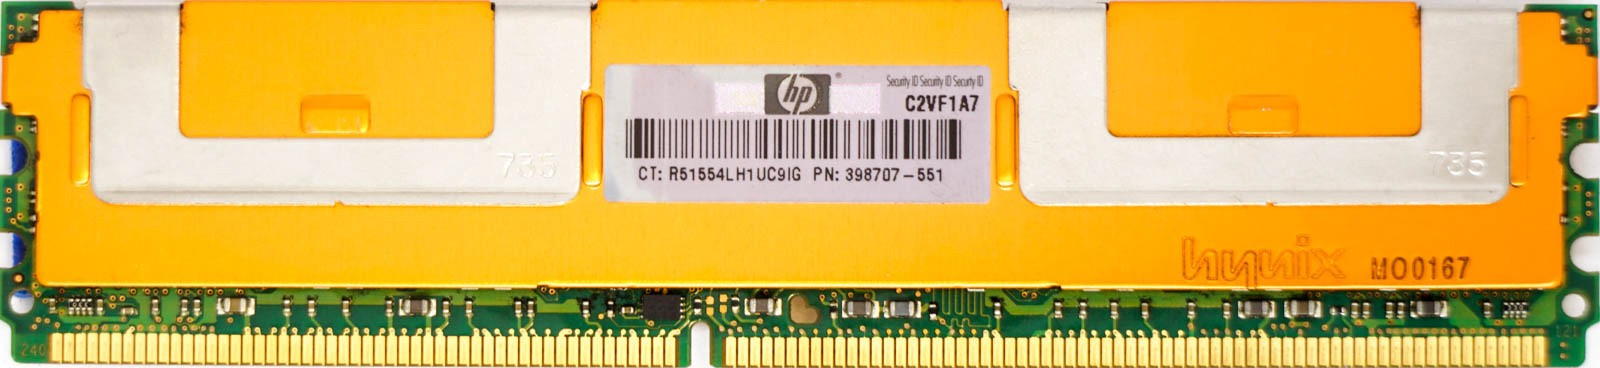 HP 2GB PC2-5300F Server Memory RAM 398707-551